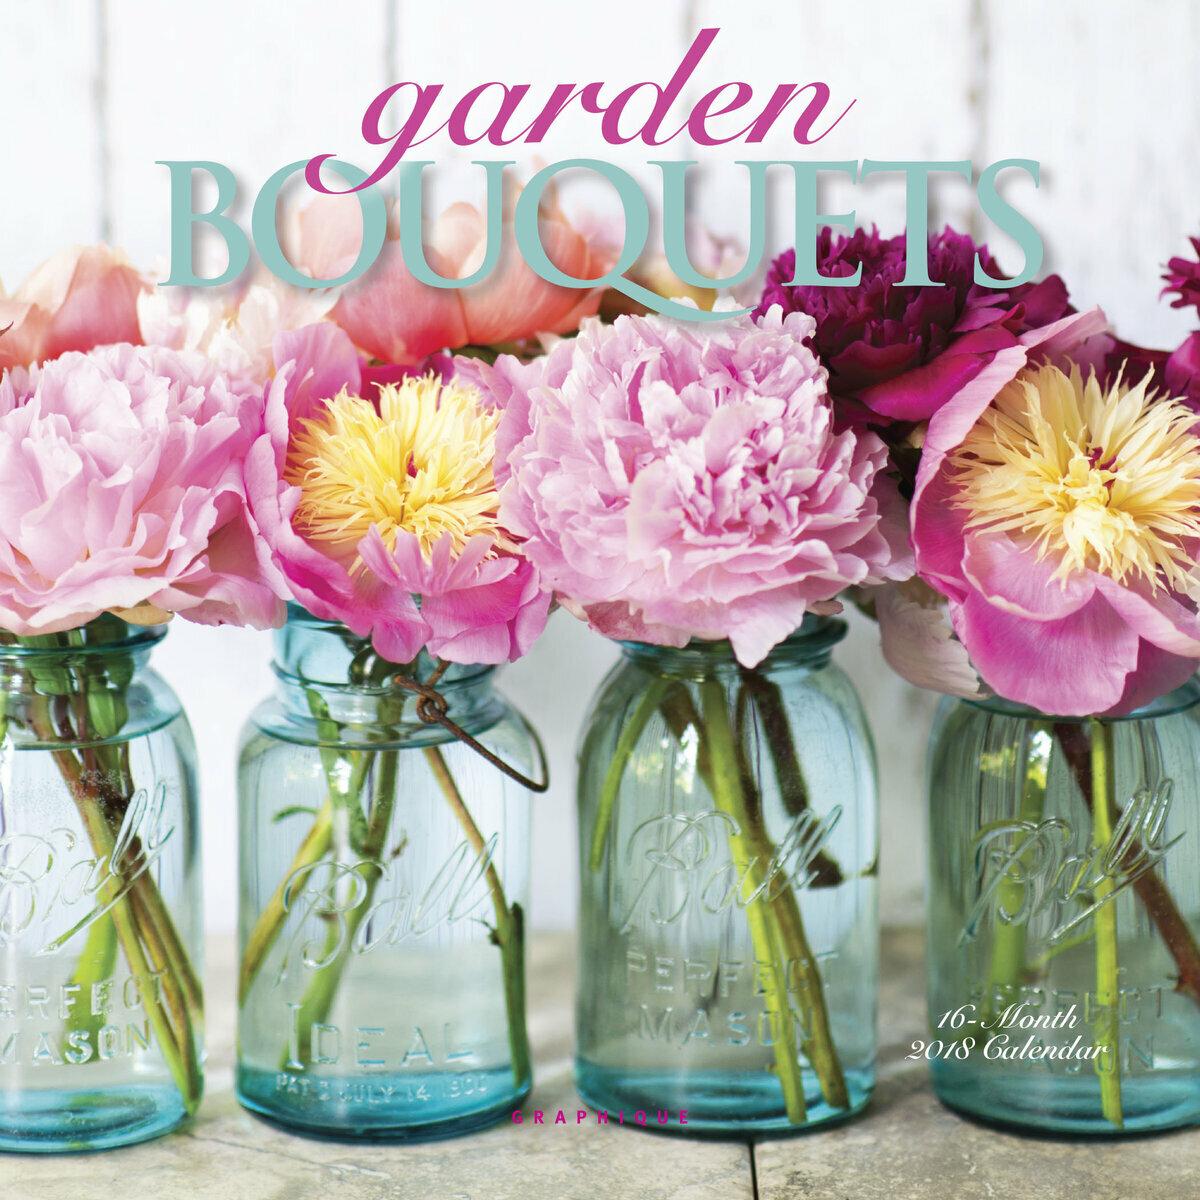 mini calendrier bouqeuts de fleurs du jardin 2018. Black Bedroom Furniture Sets. Home Design Ideas